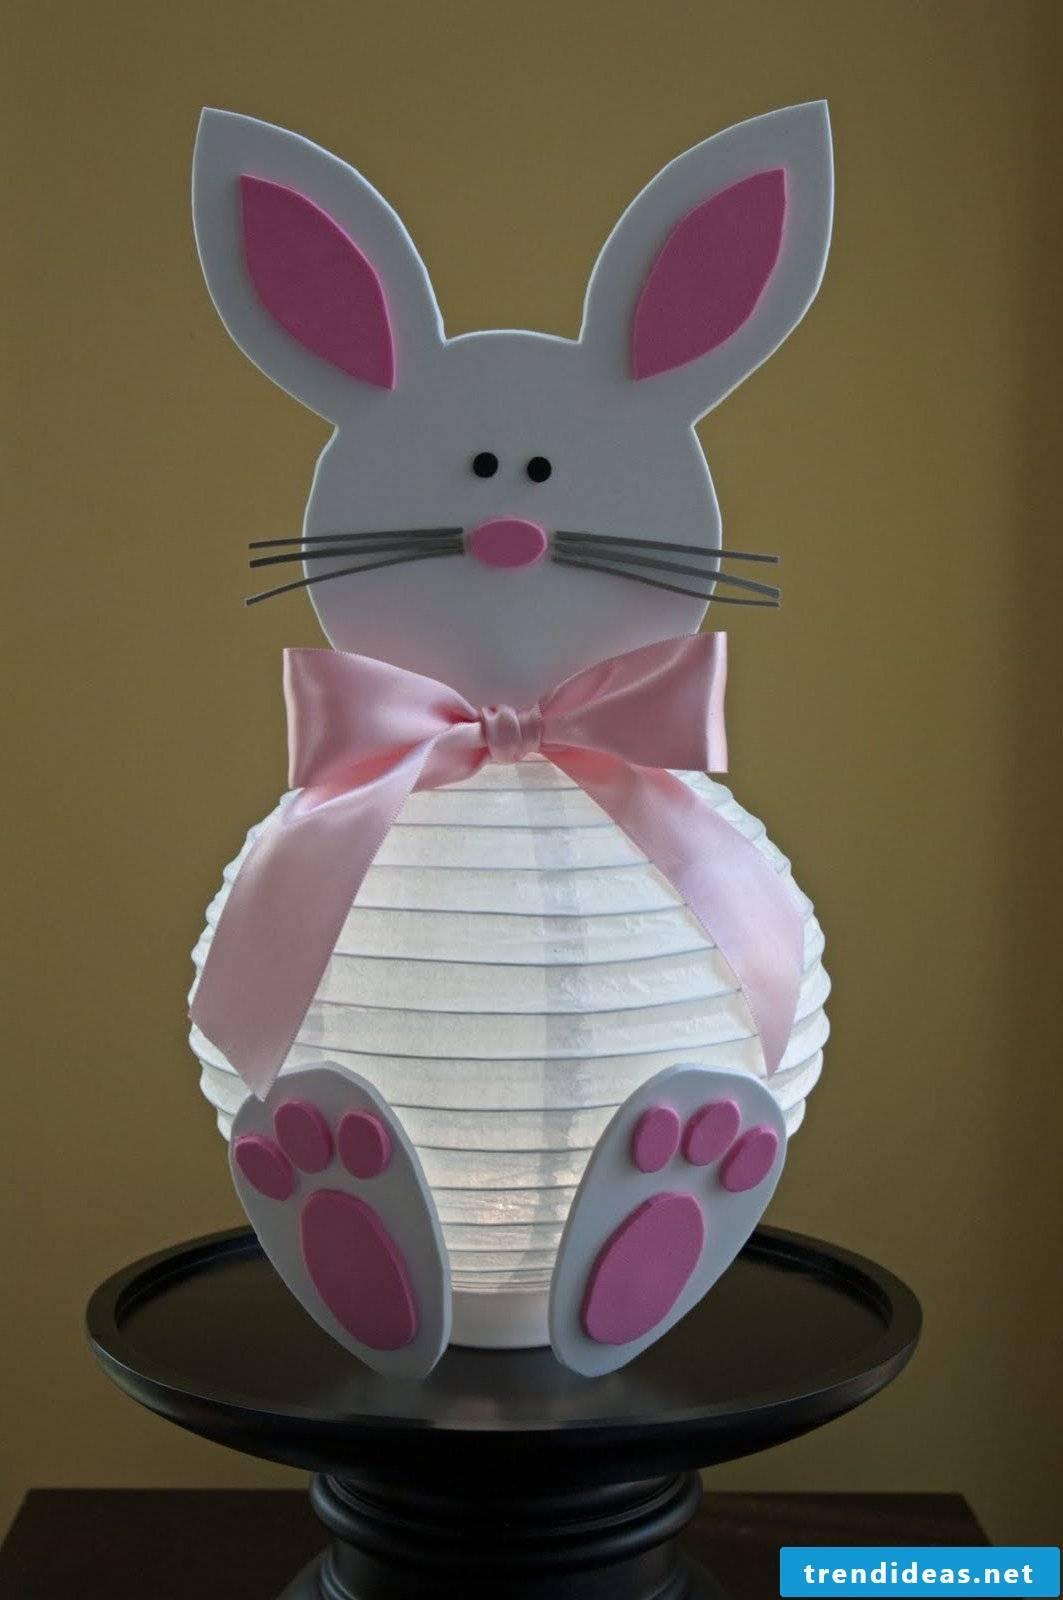 Making lantern for children - a cute bunny